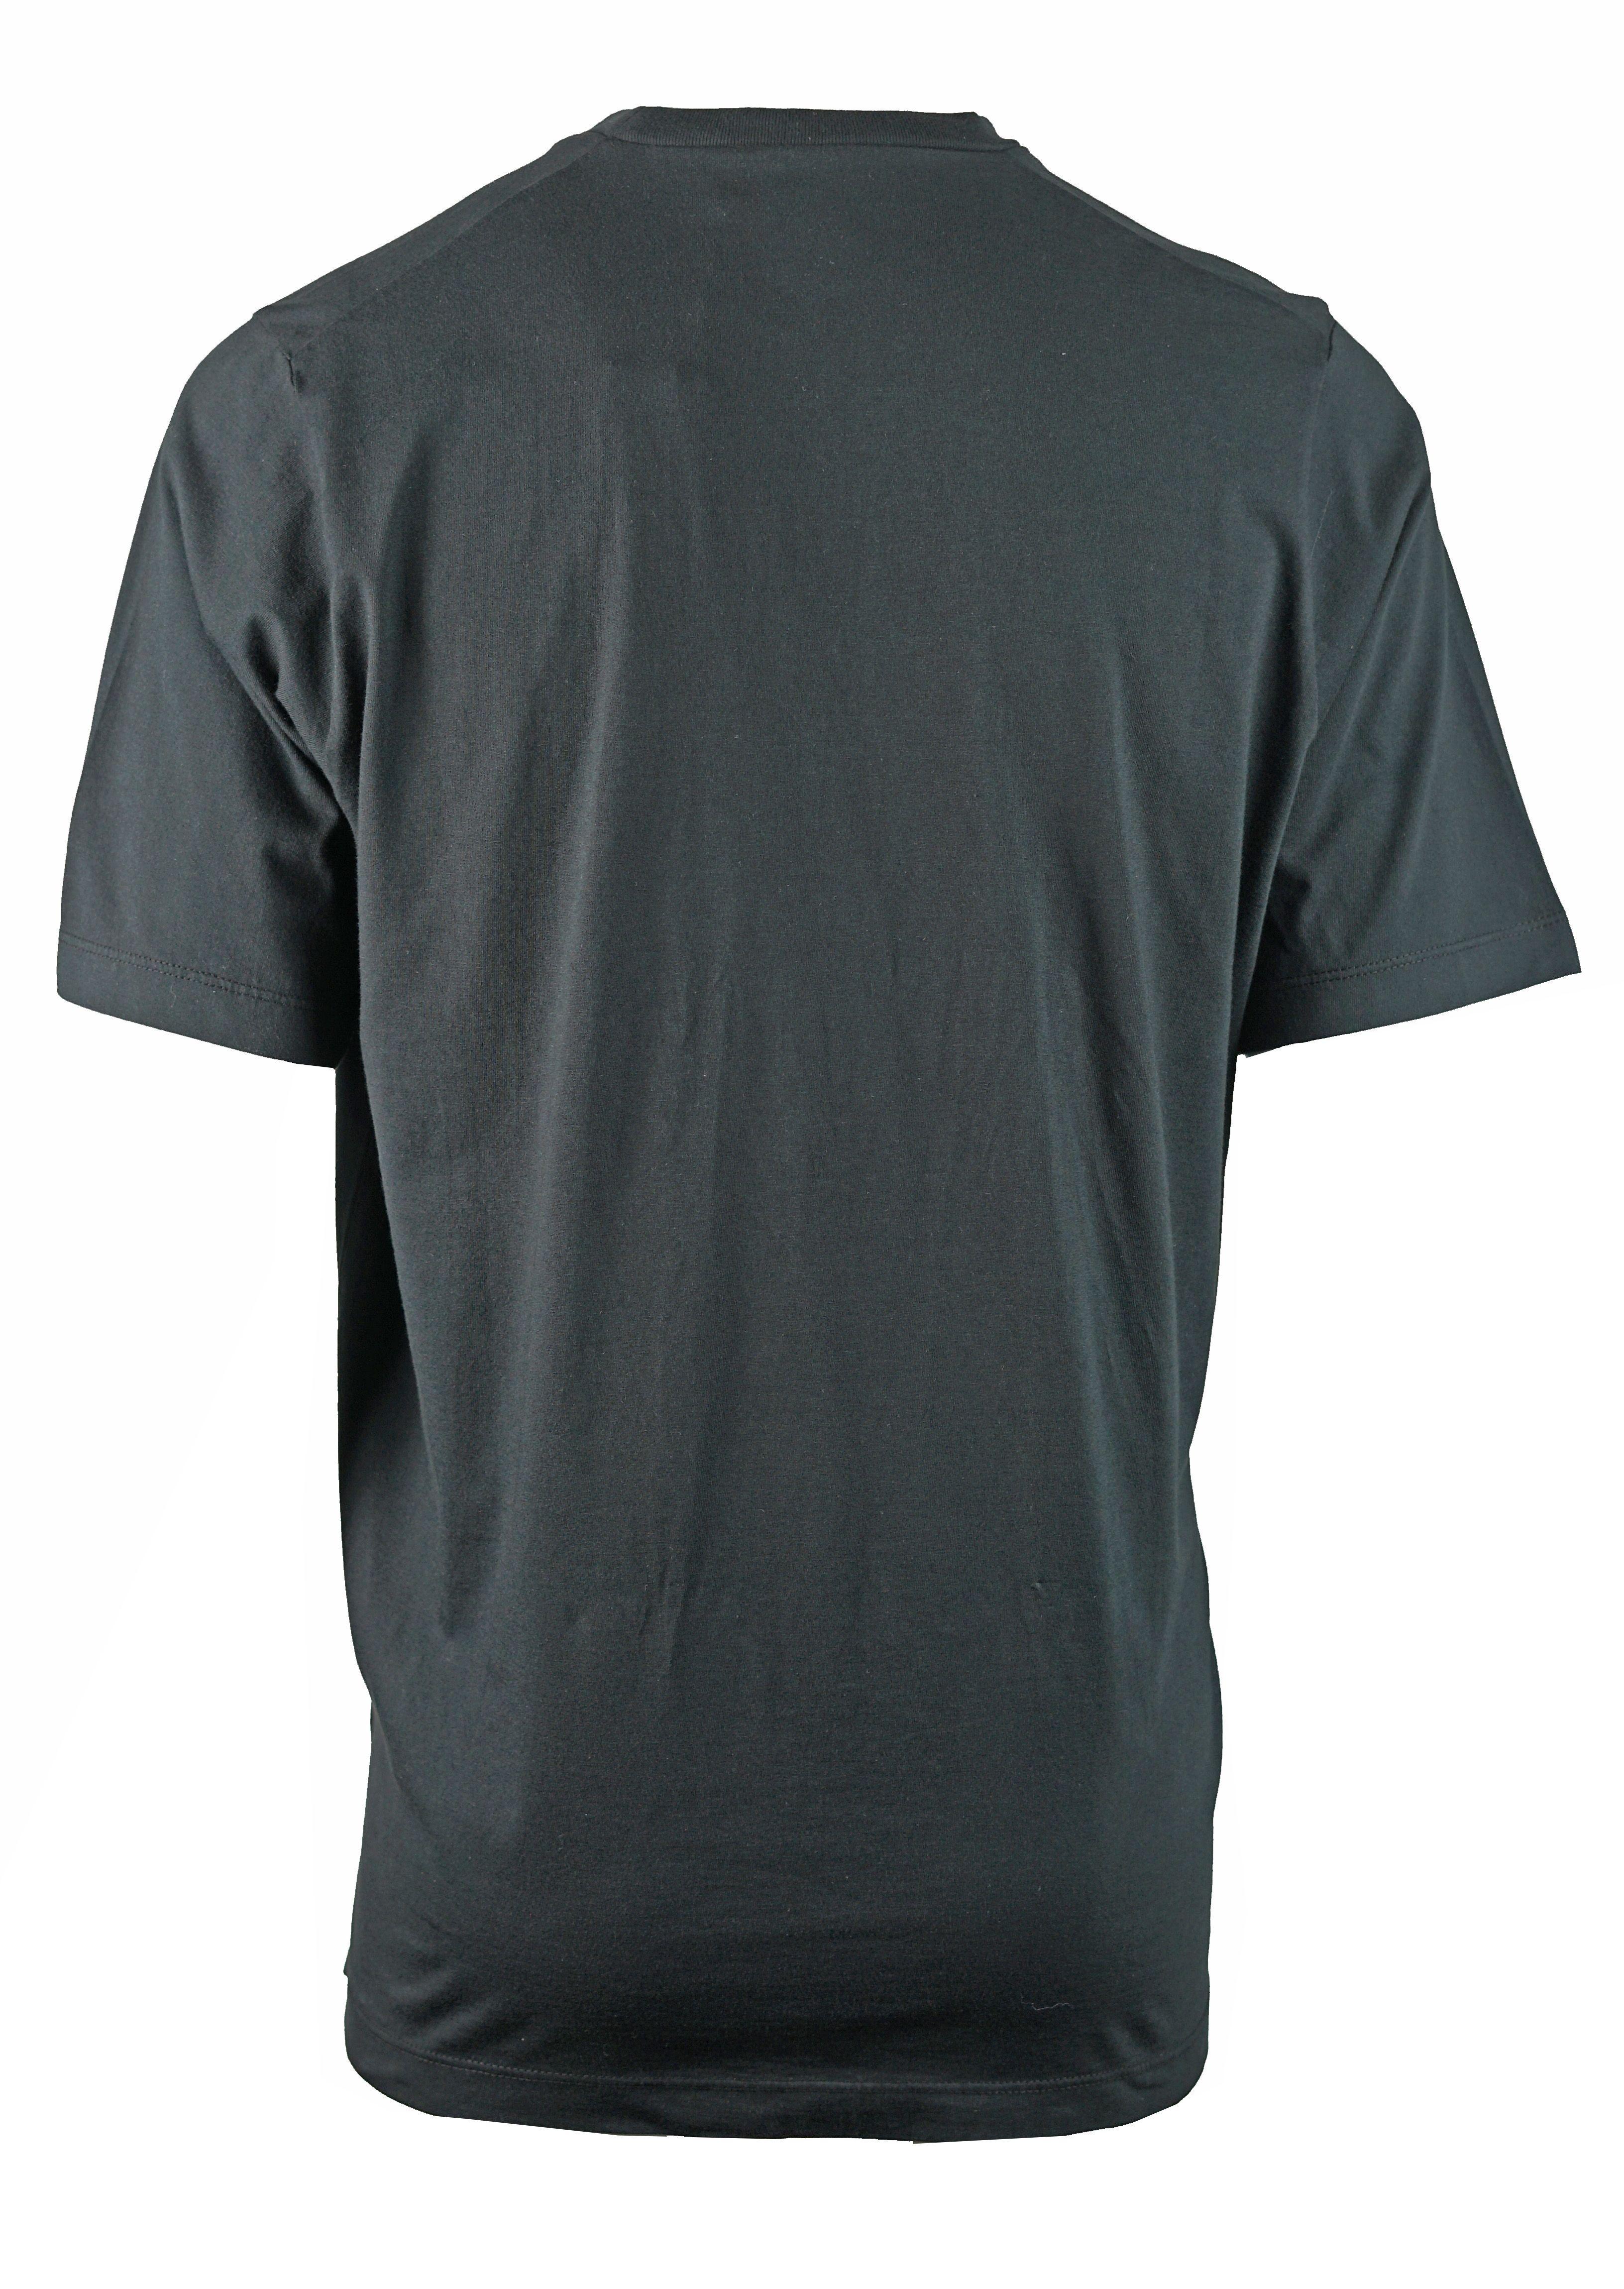 DSquared2 S74GD0472 S20694 900 T-Shirt